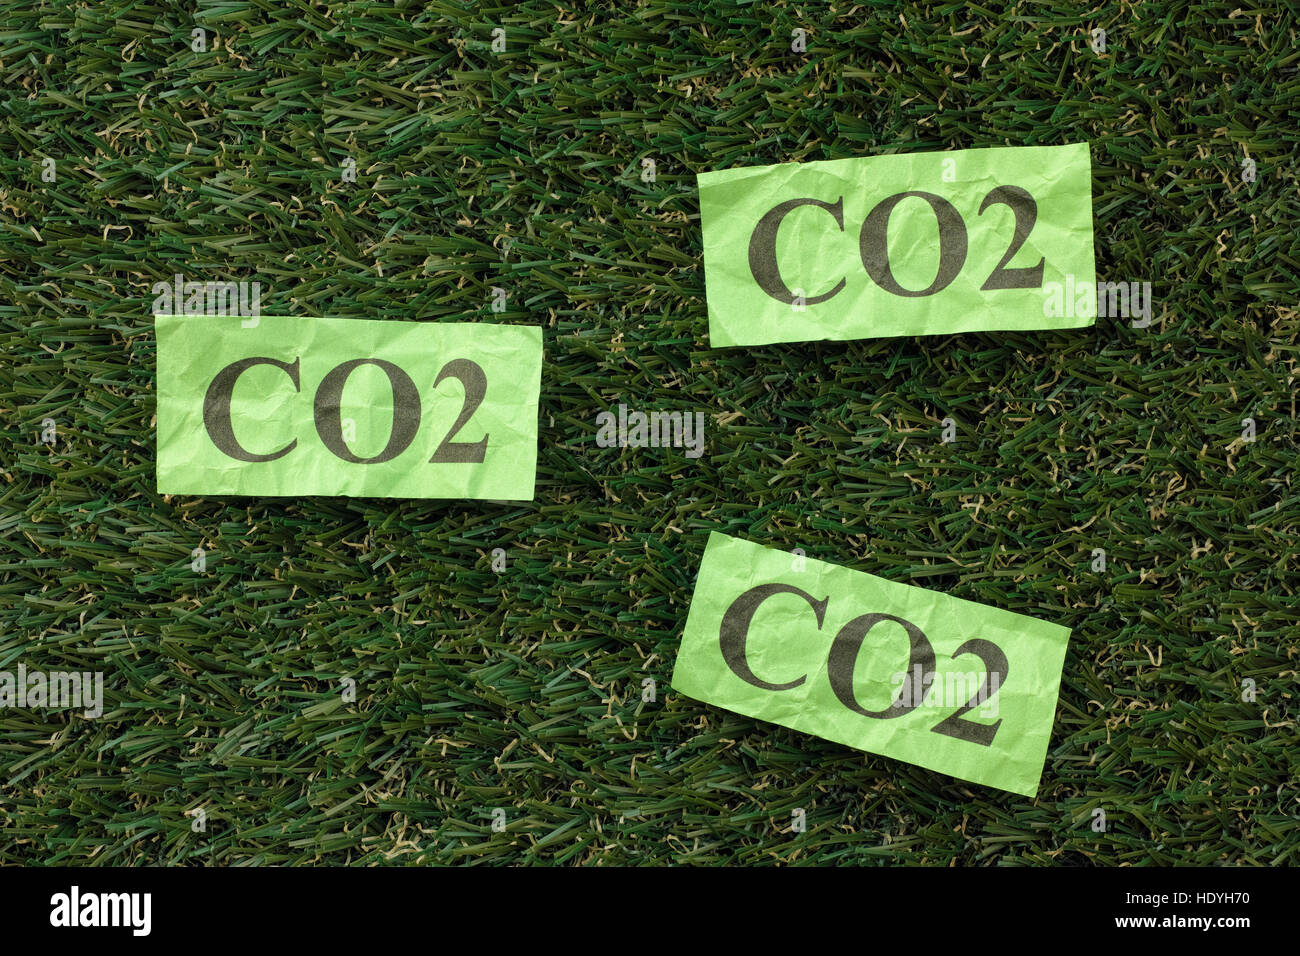 Nube de dióxido de carbono (CO2) en un césped verde. Concepto imagen. Cerca. Imagen De Stock